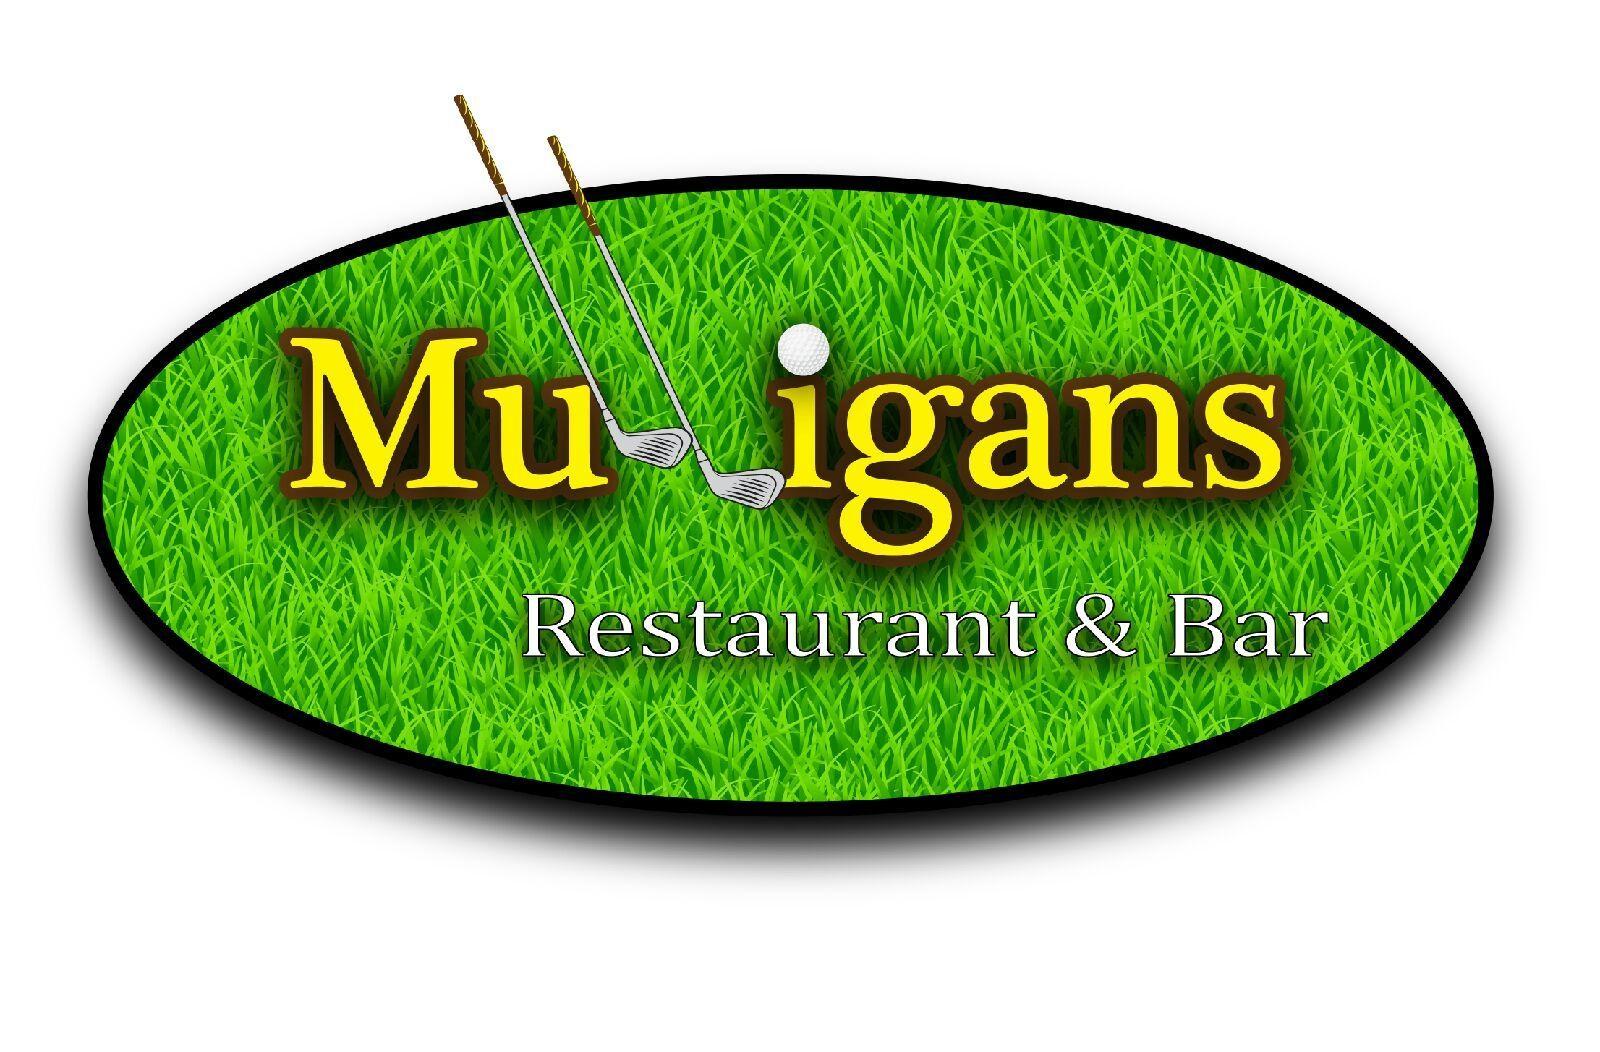 Mulligans Logo